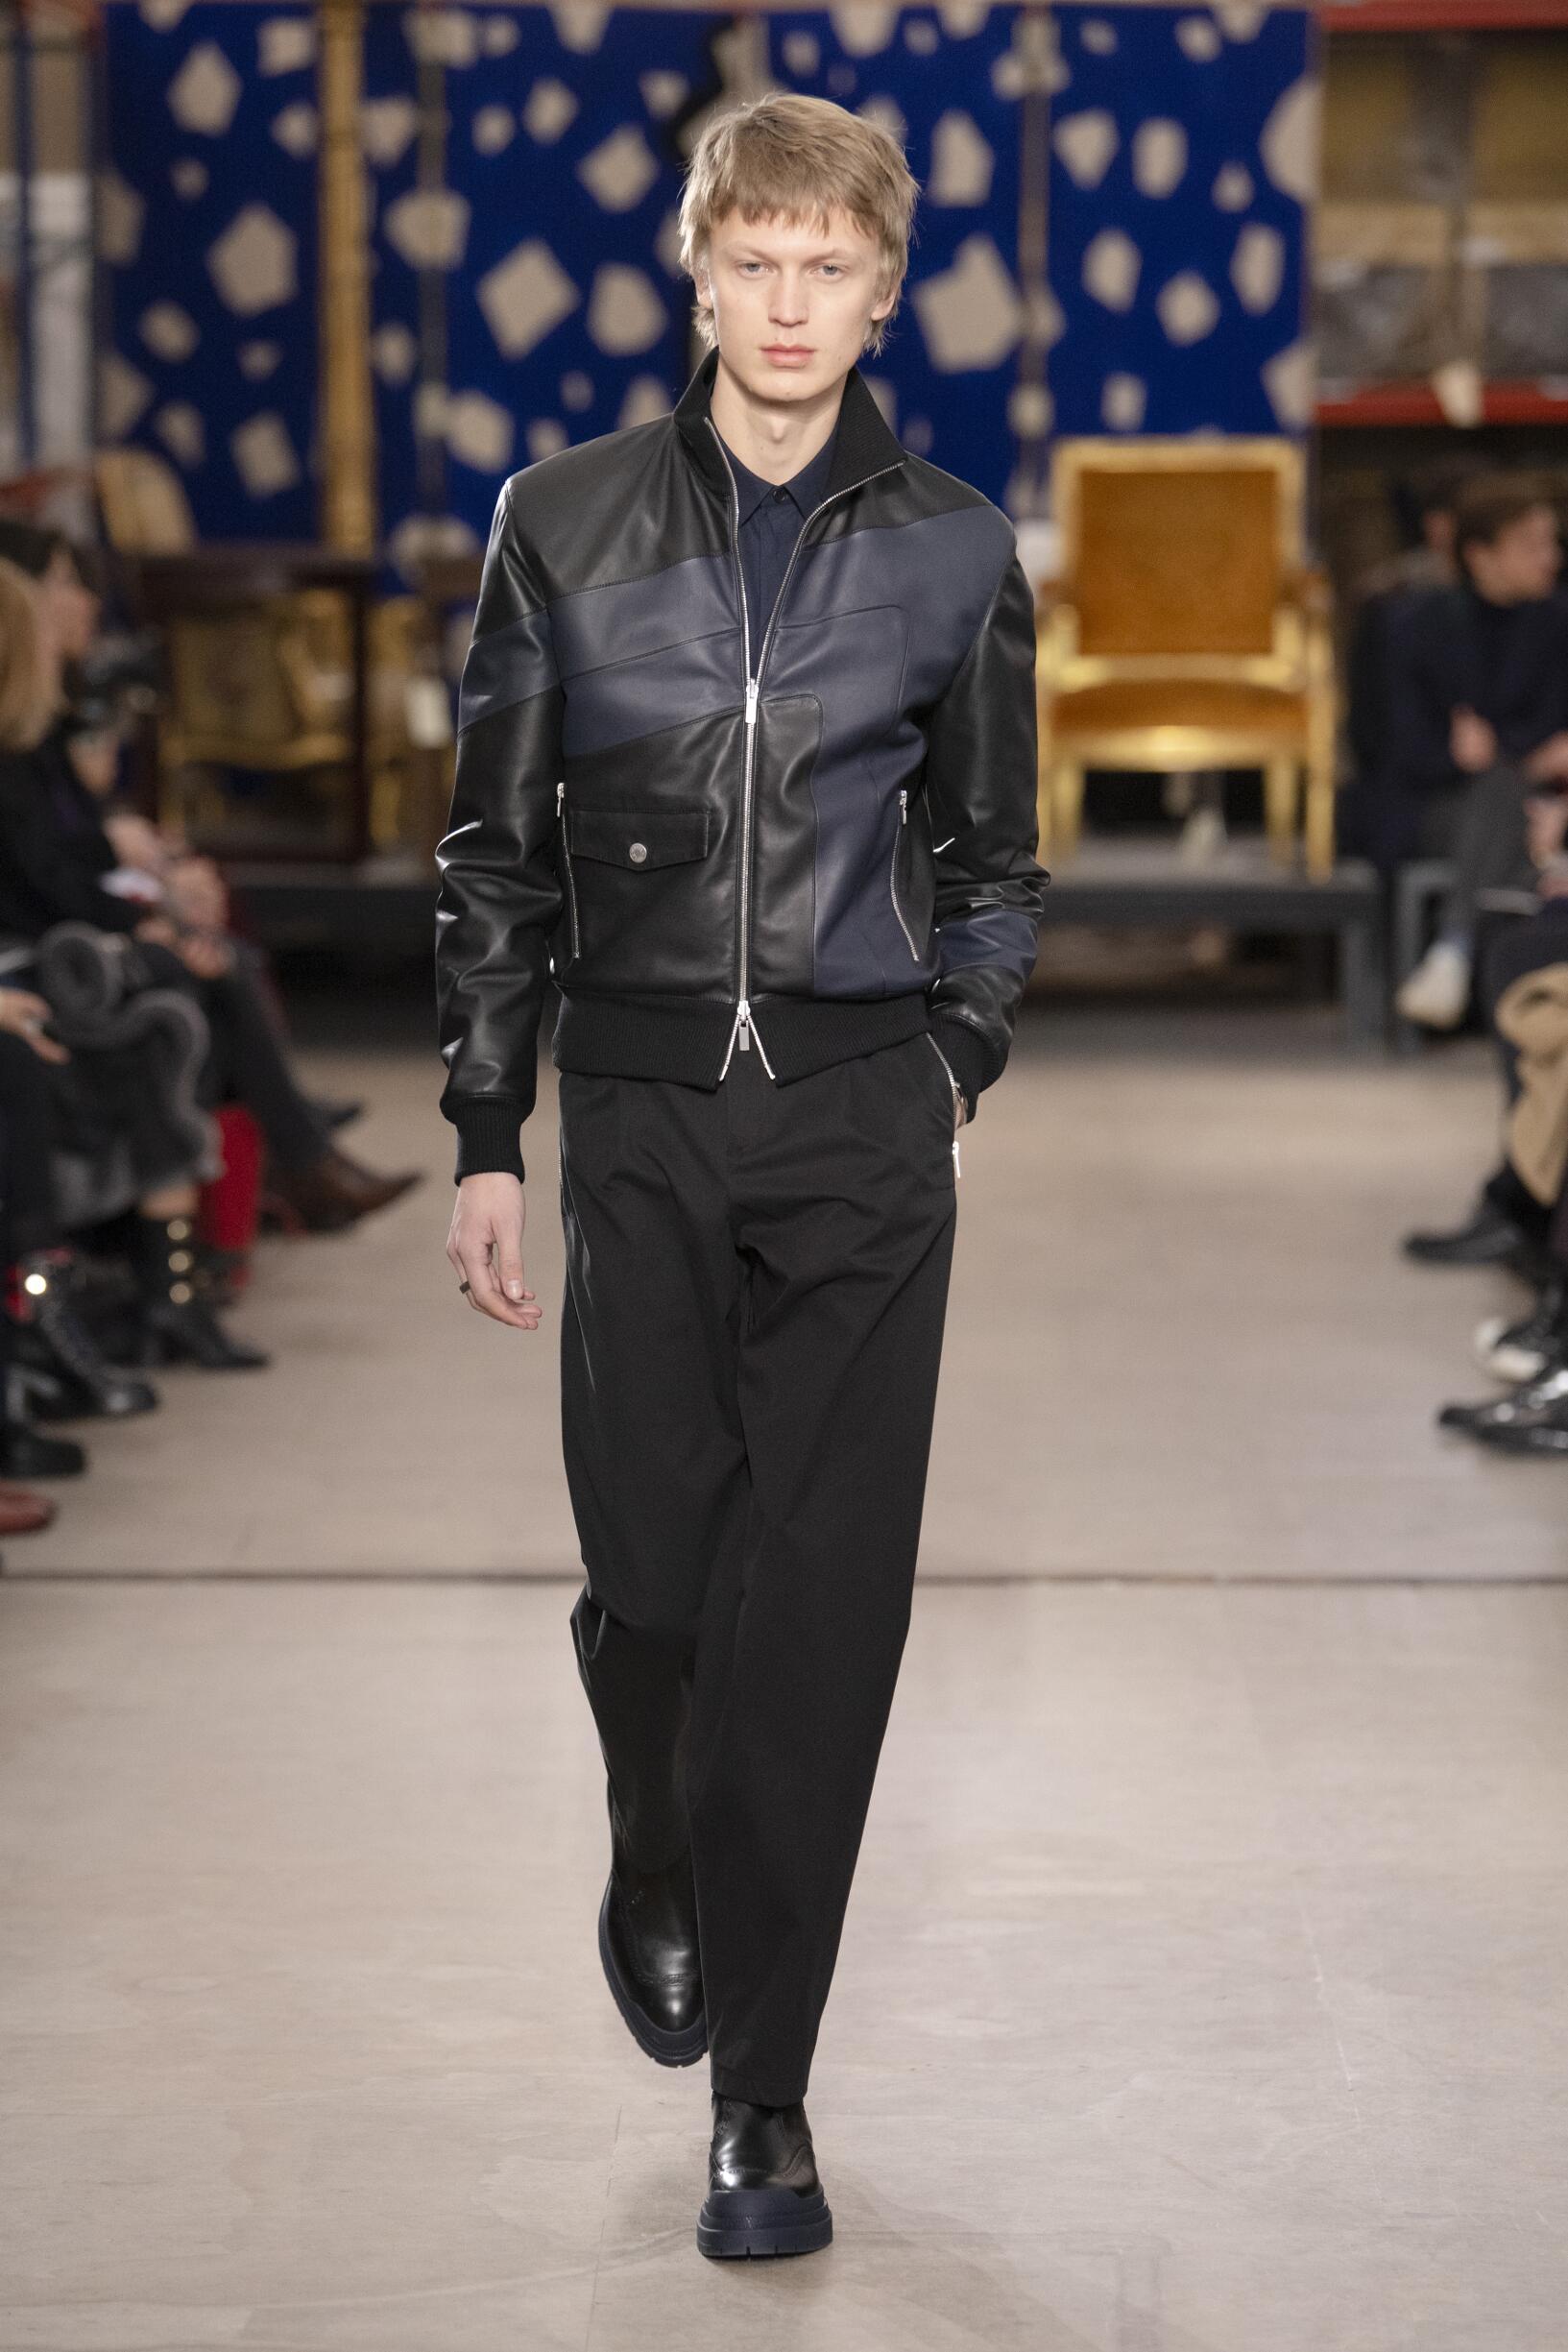 2019 Catwalk Hermès Man Fashion Show Winter